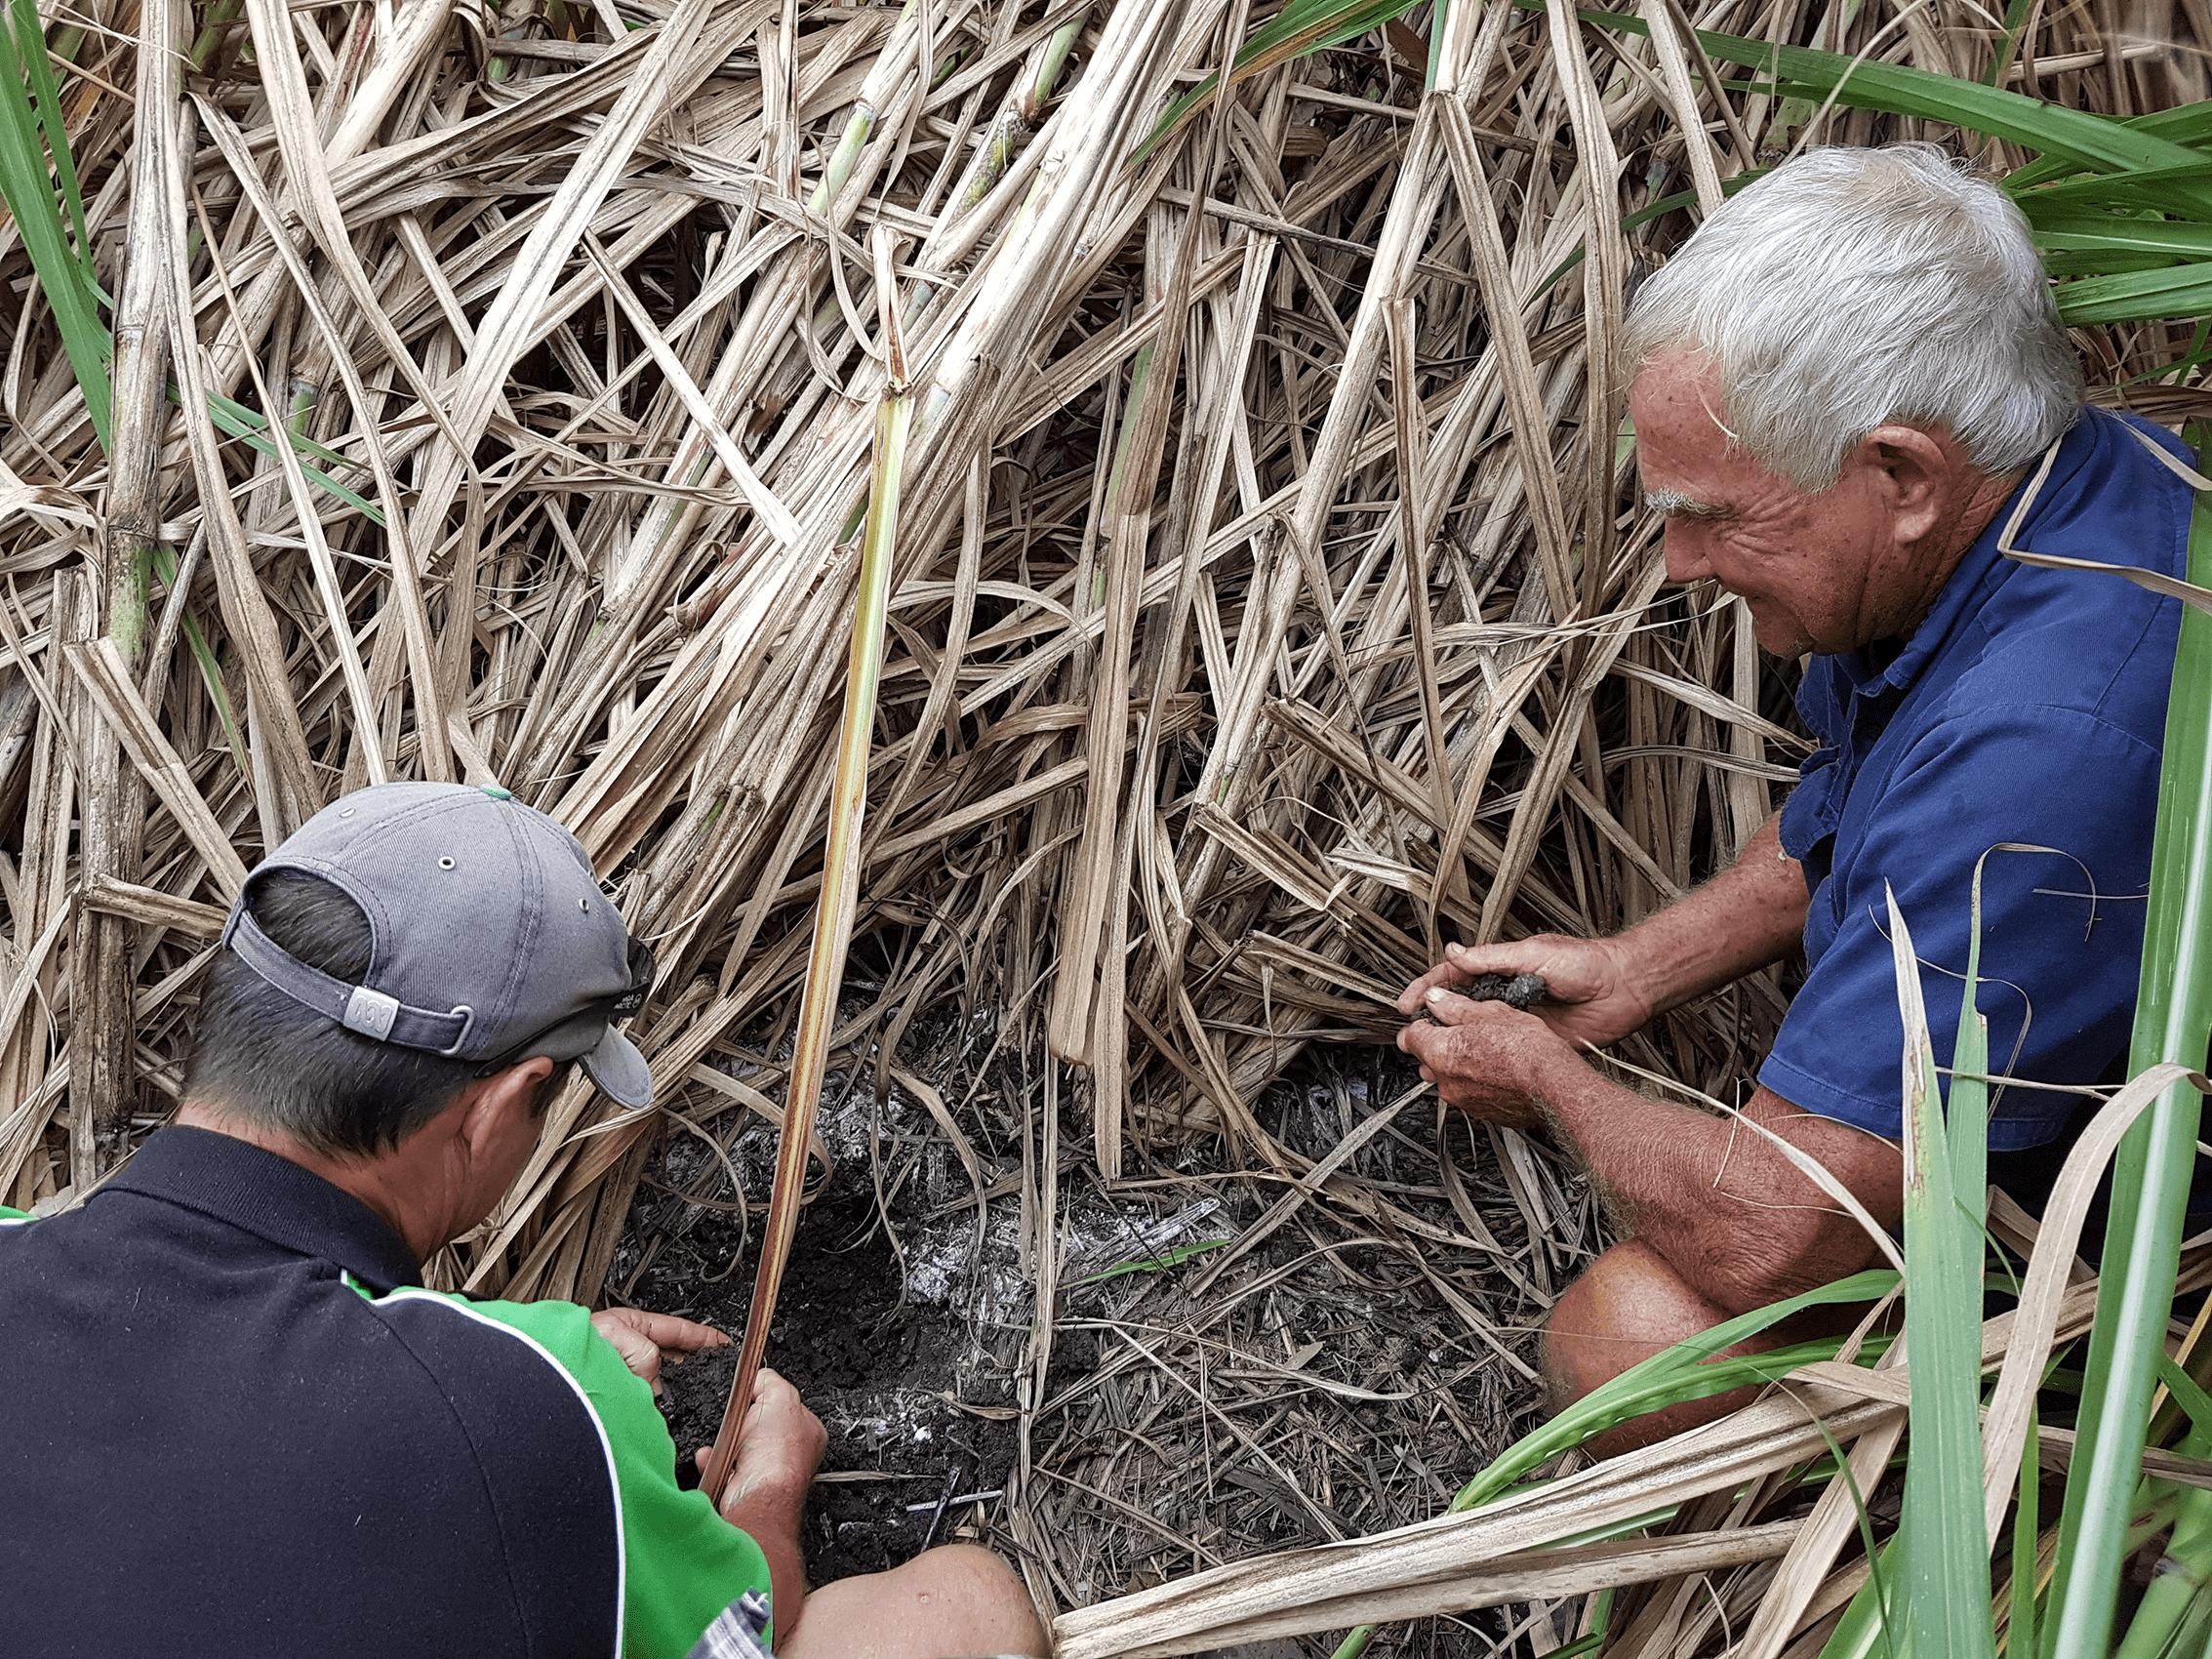 Checking soil on sugar cane farm in QLD